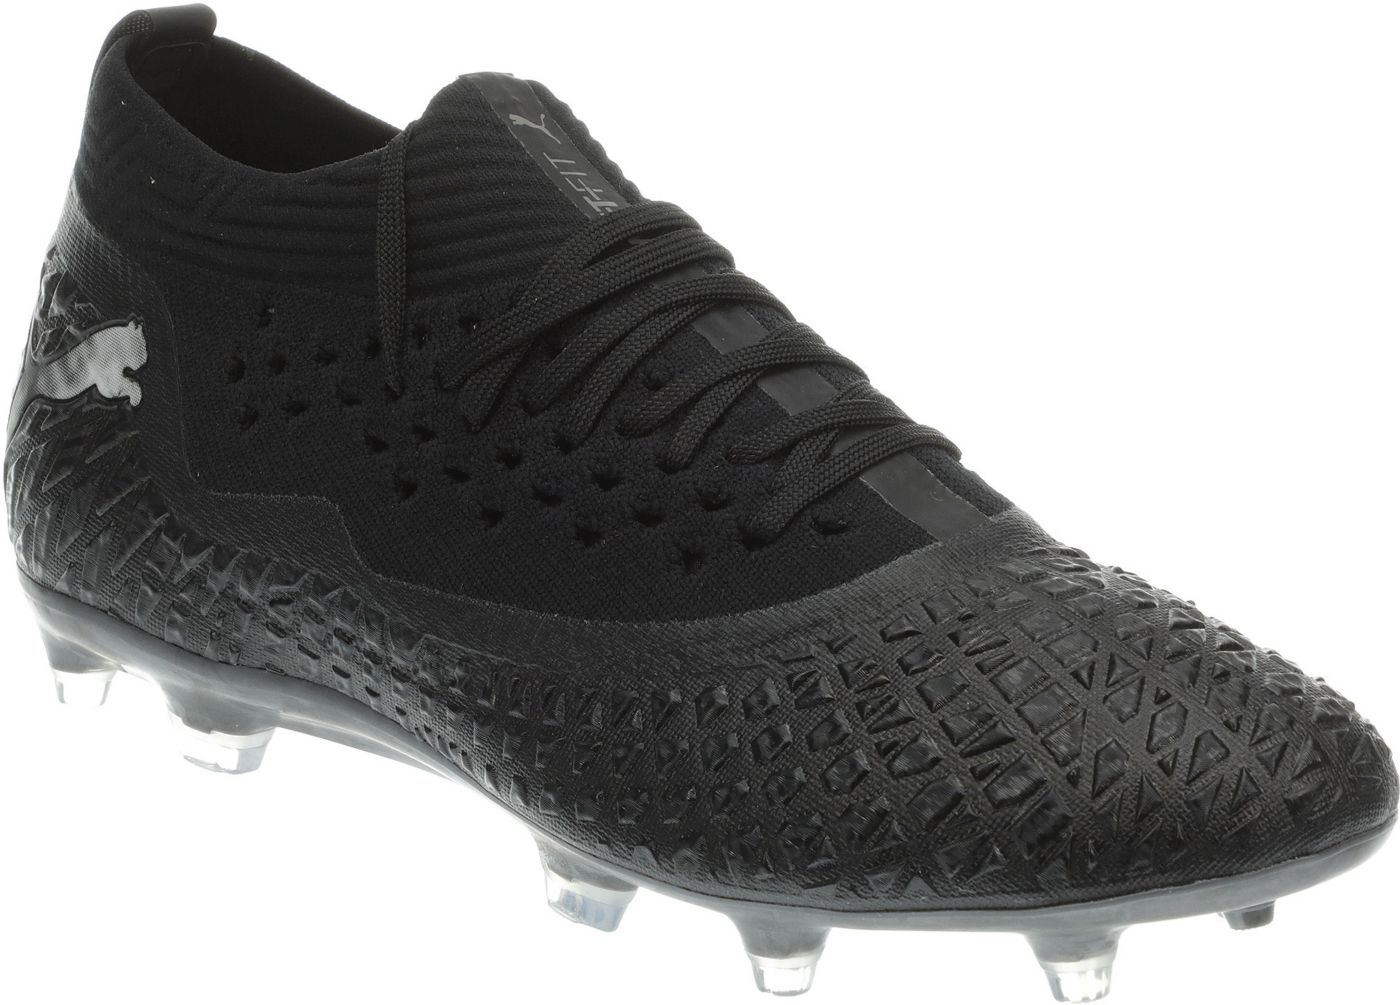 PUMA Men's Future 4.2 Netfit FG/AG Soccer Cleats